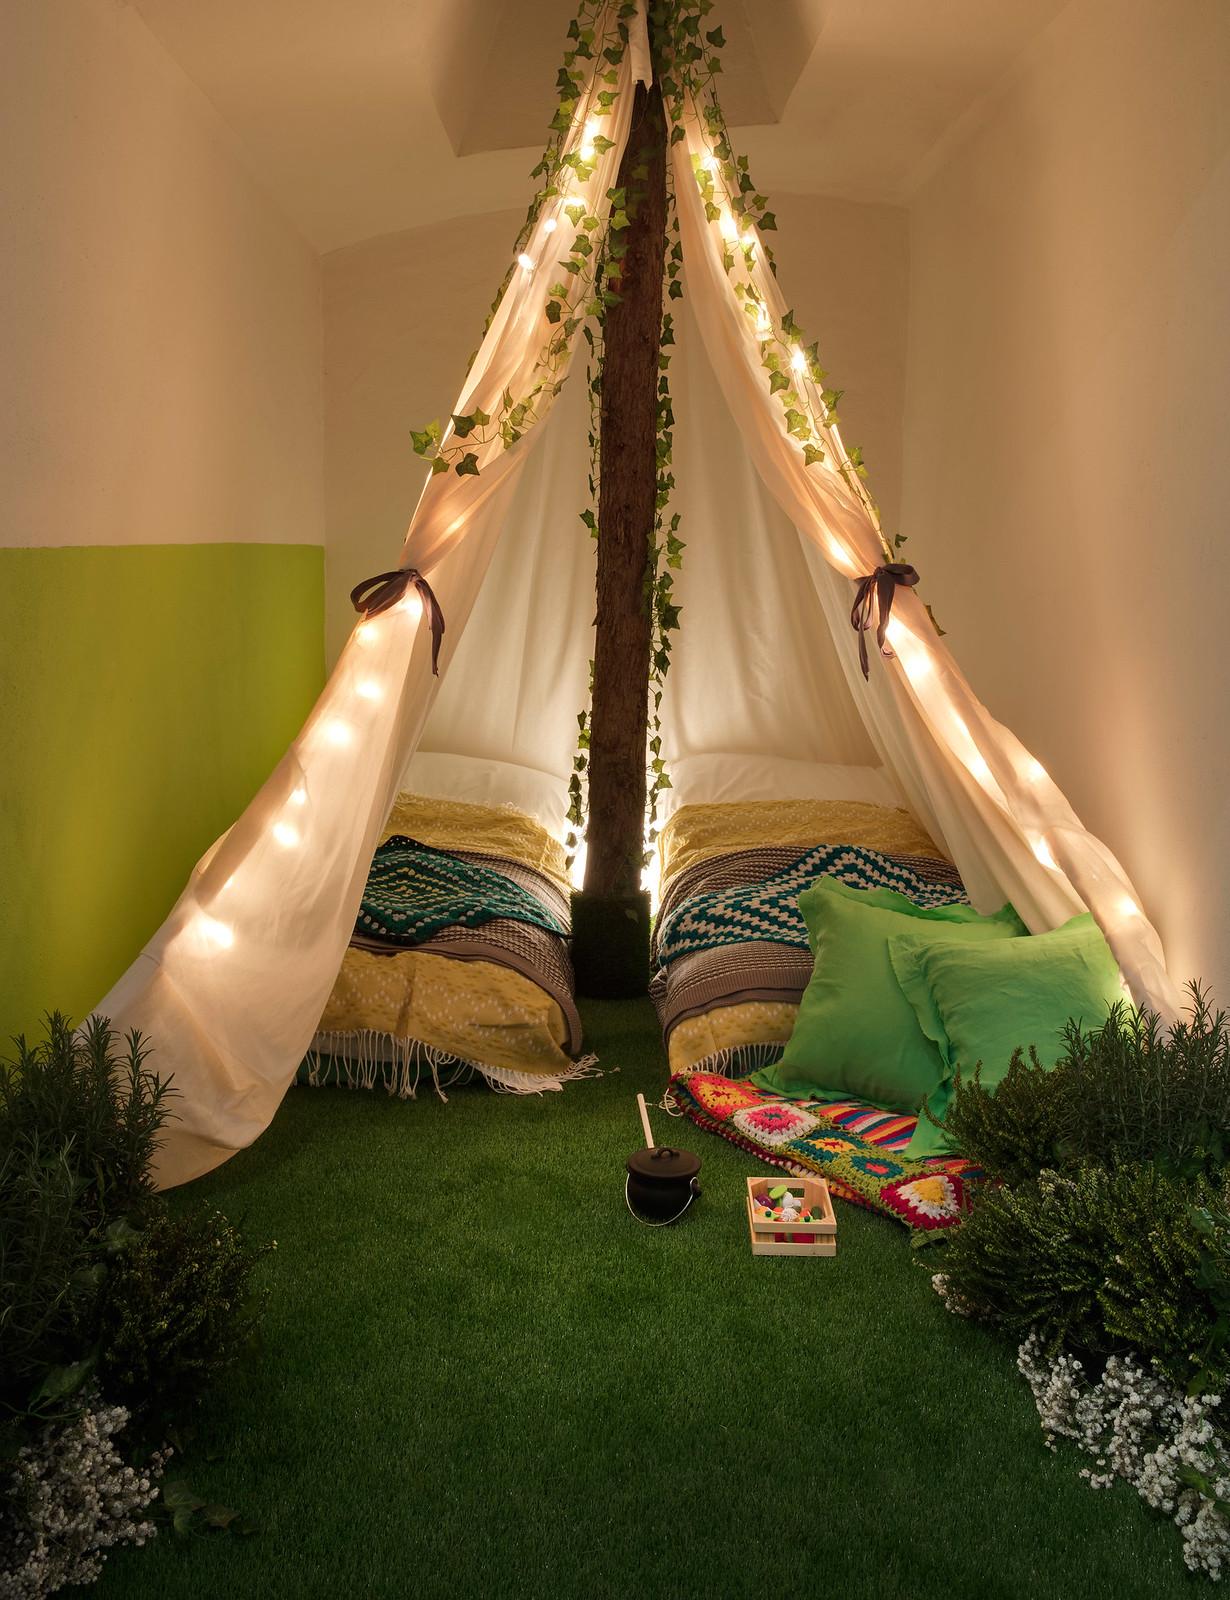 greenery-apartment-installation-airbnb-pantone-design_dezeen_2364_col_9